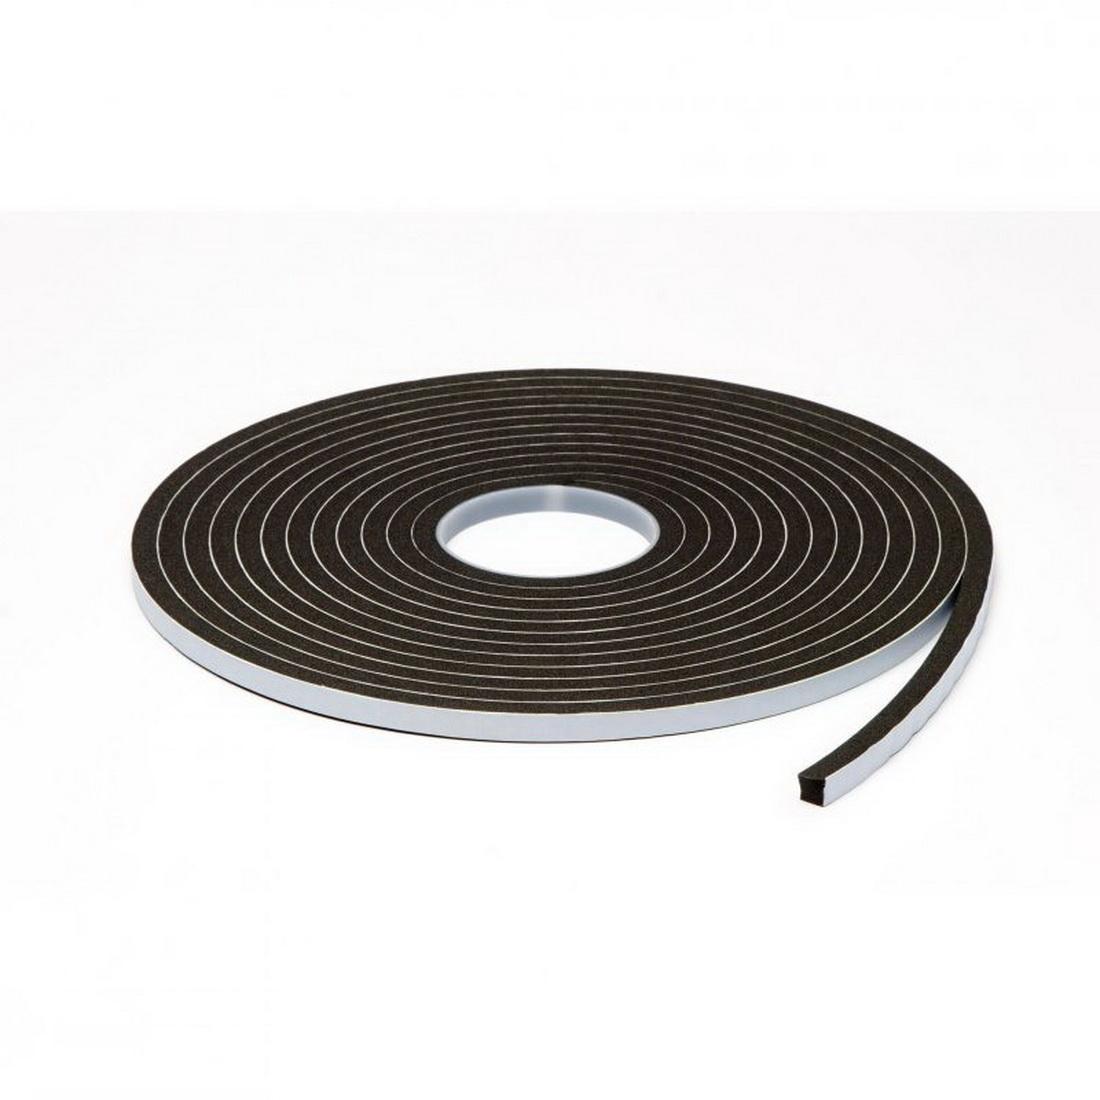 Sellotape Inseal Single-Sided Foam Tape 19mm Thick - 10mm Wide – 5 Metre roll Black 3109